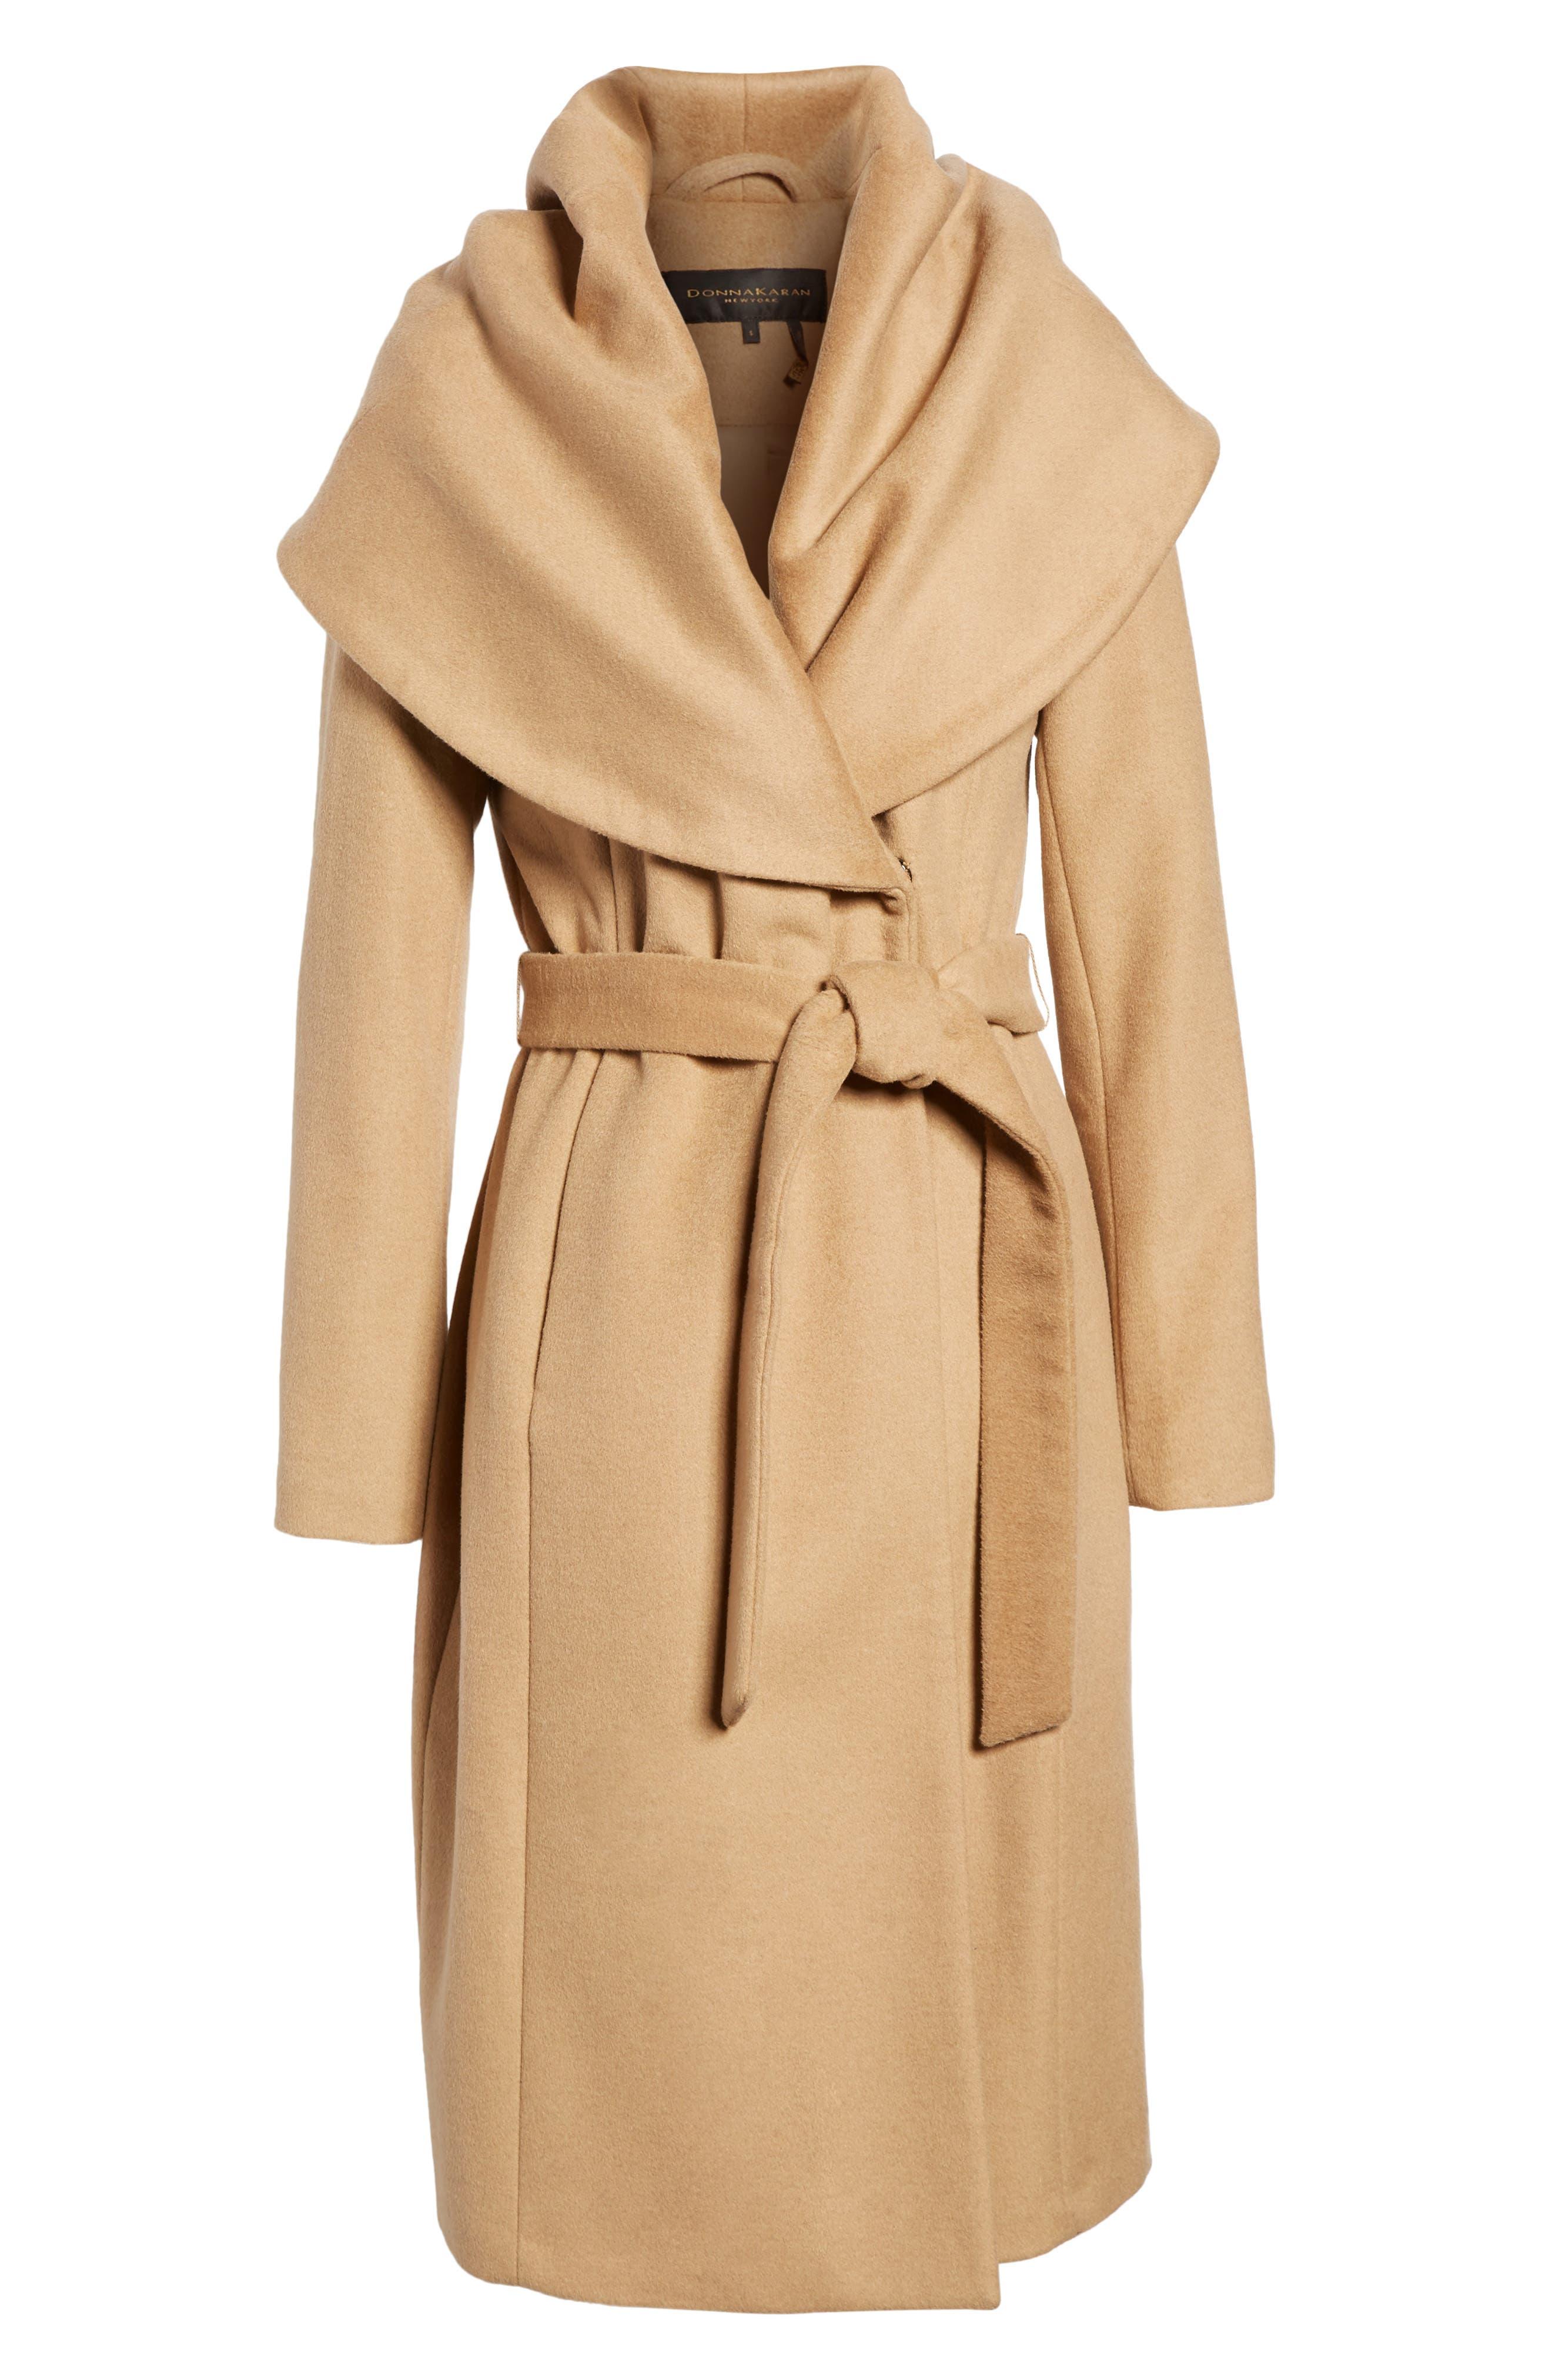 DKNY Wool Blend Shawl Collar Wrap Coat,                             Alternate thumbnail 5, color,                             252